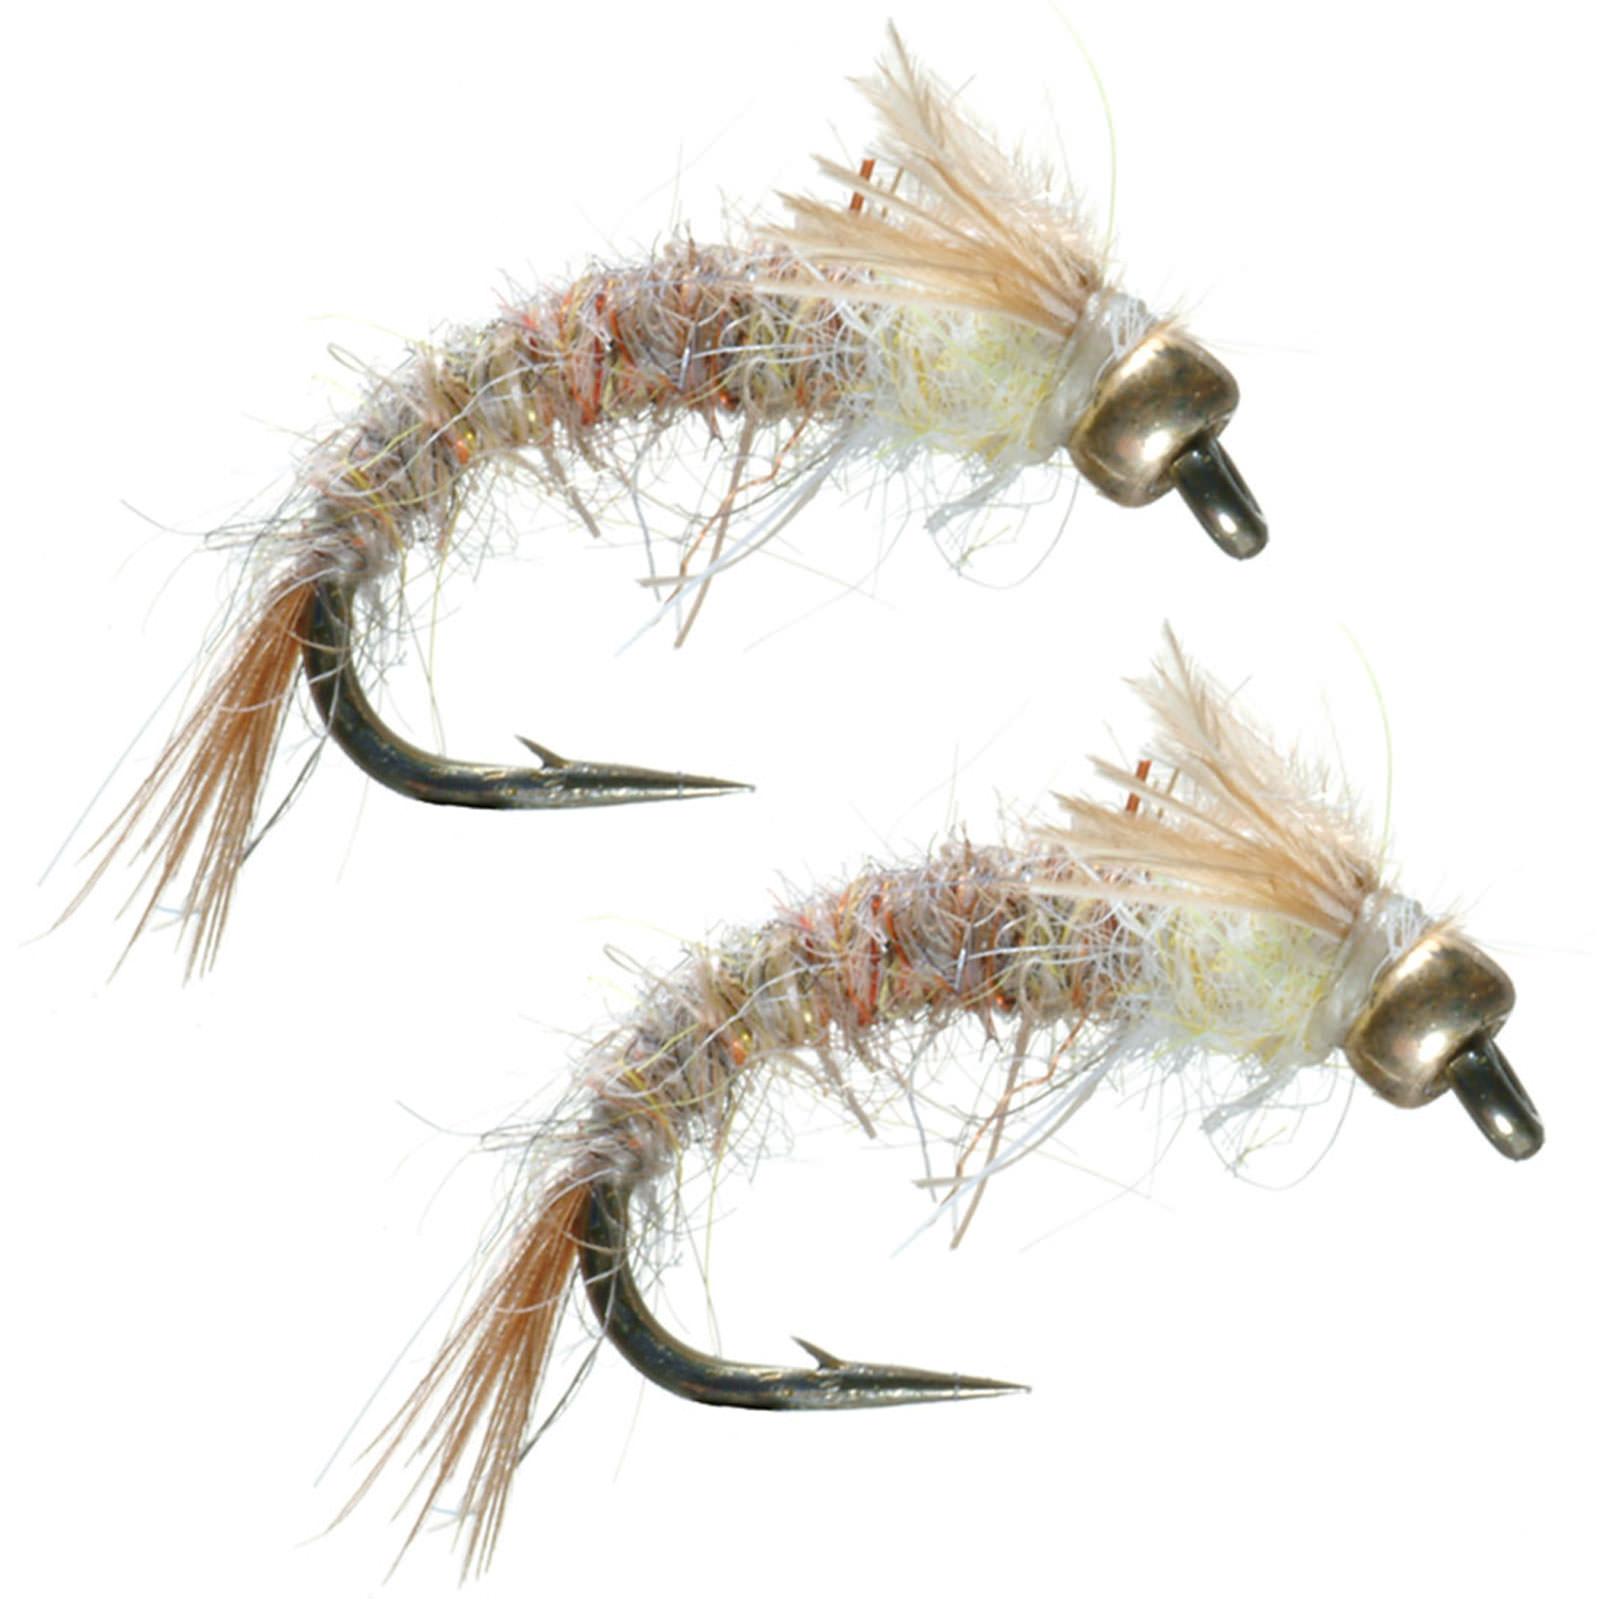 Umpqua barr 39 s bead head emerger pmd fly fishing midges for Midge fly fishing